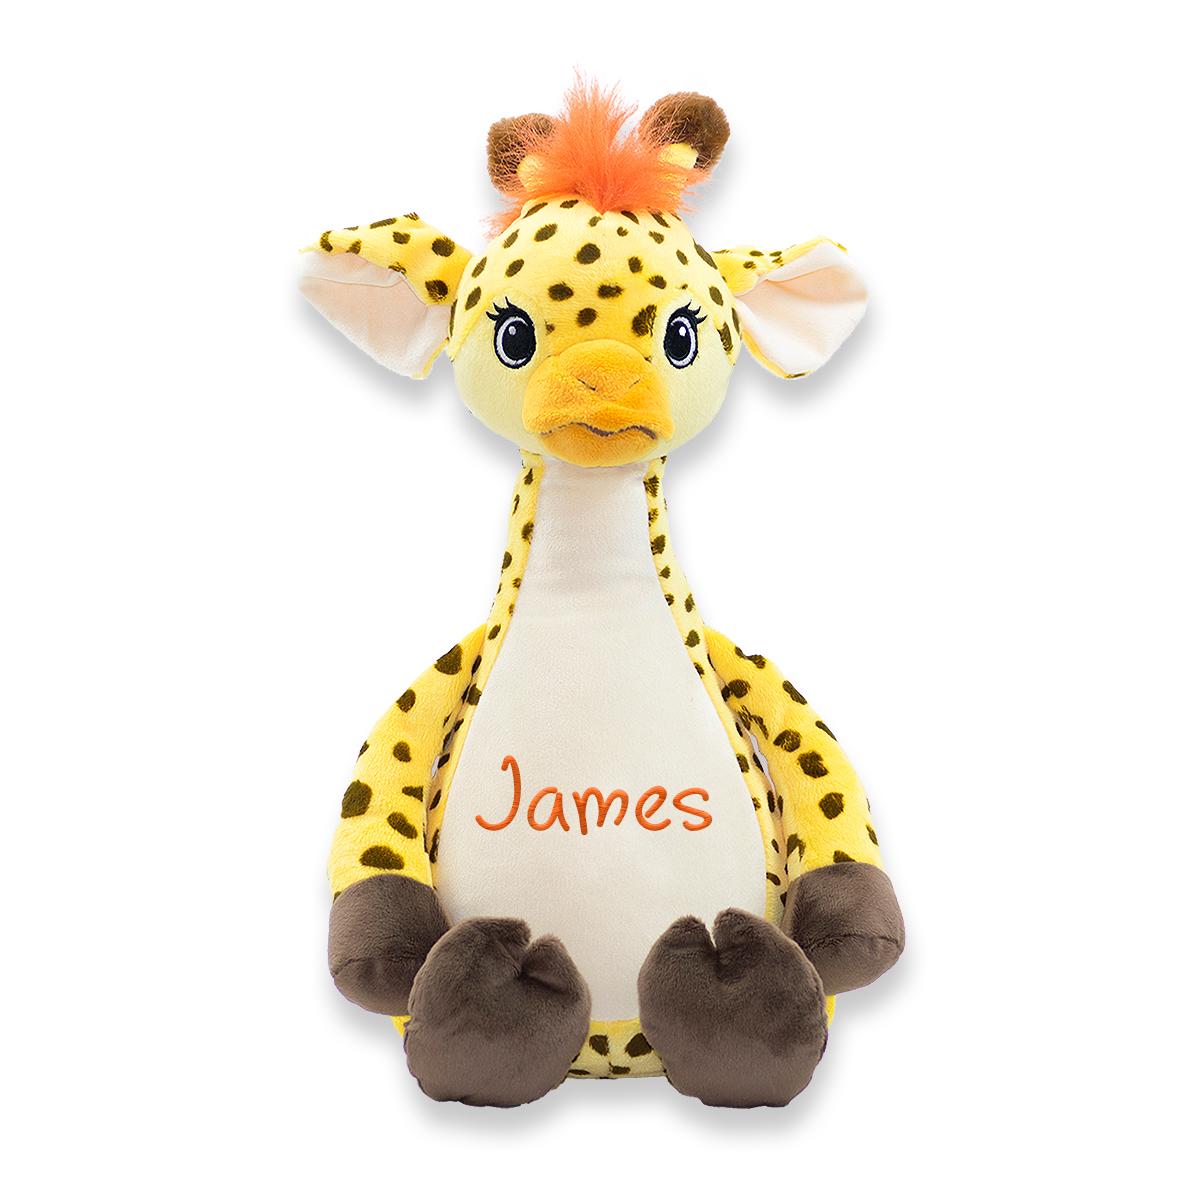 Cubby_0003_Tumbleberry-Giraffe Cubbie copy